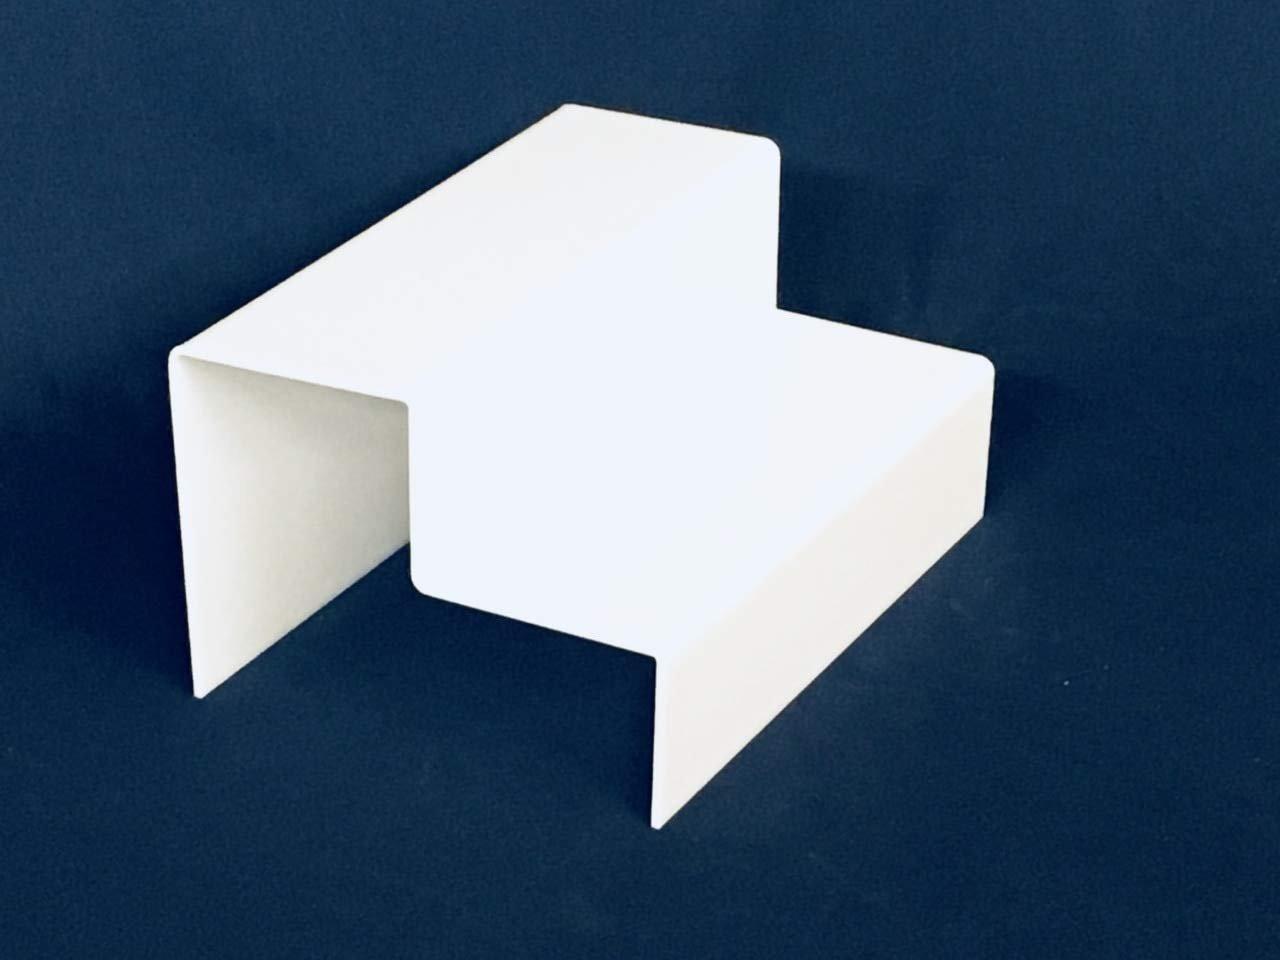 2 Step Riser Set, White, 2 Sets Included